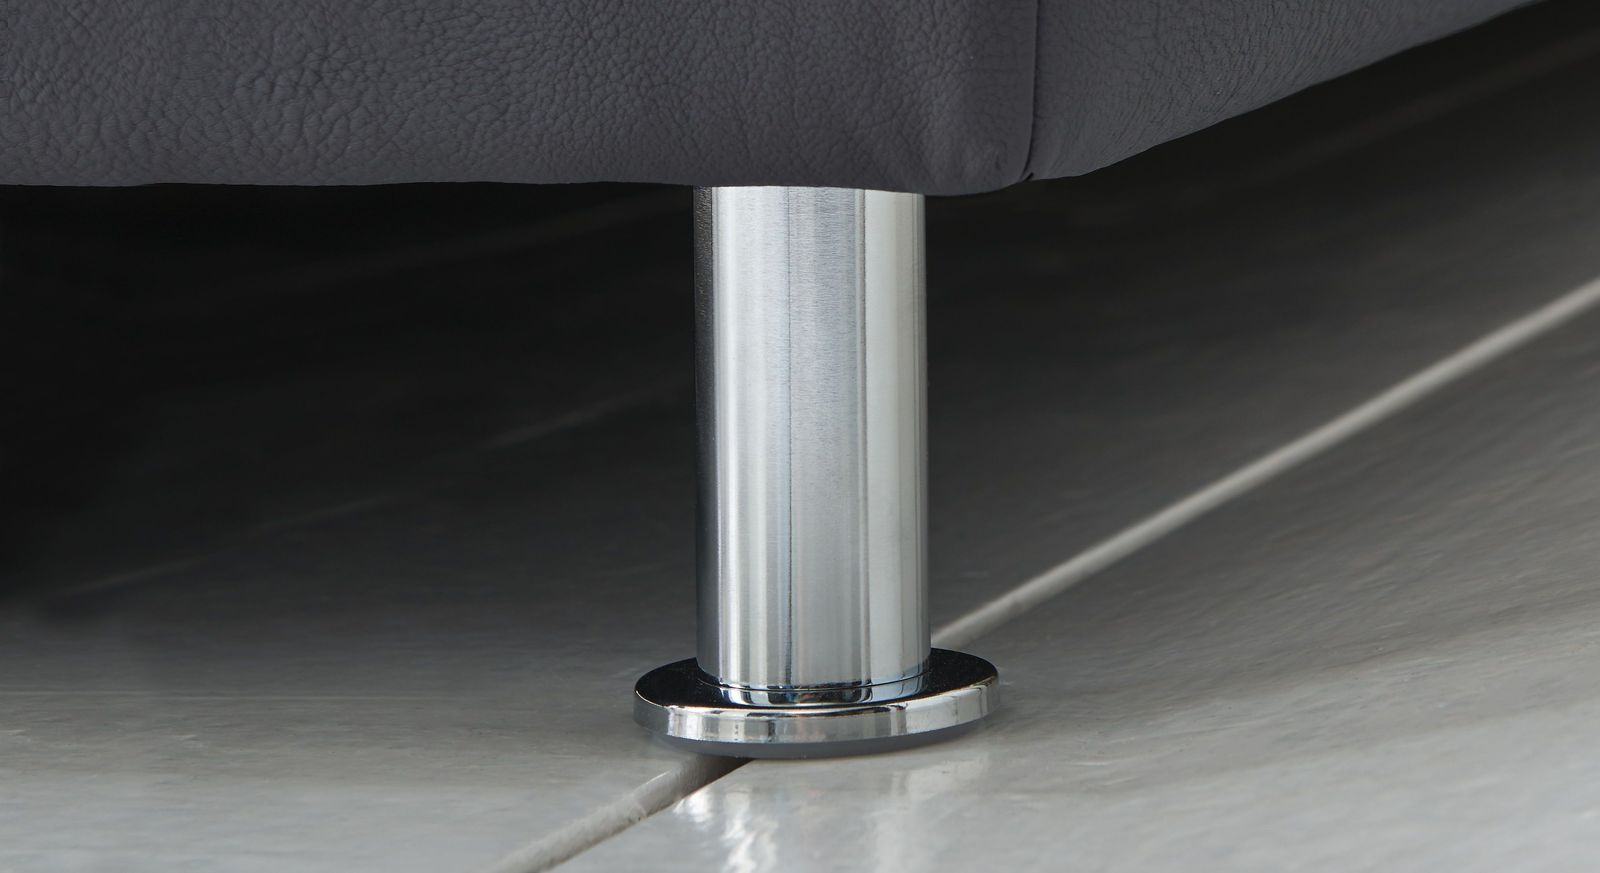 Boxspringbett Overland mit zylinderförmigen Metallfüßen